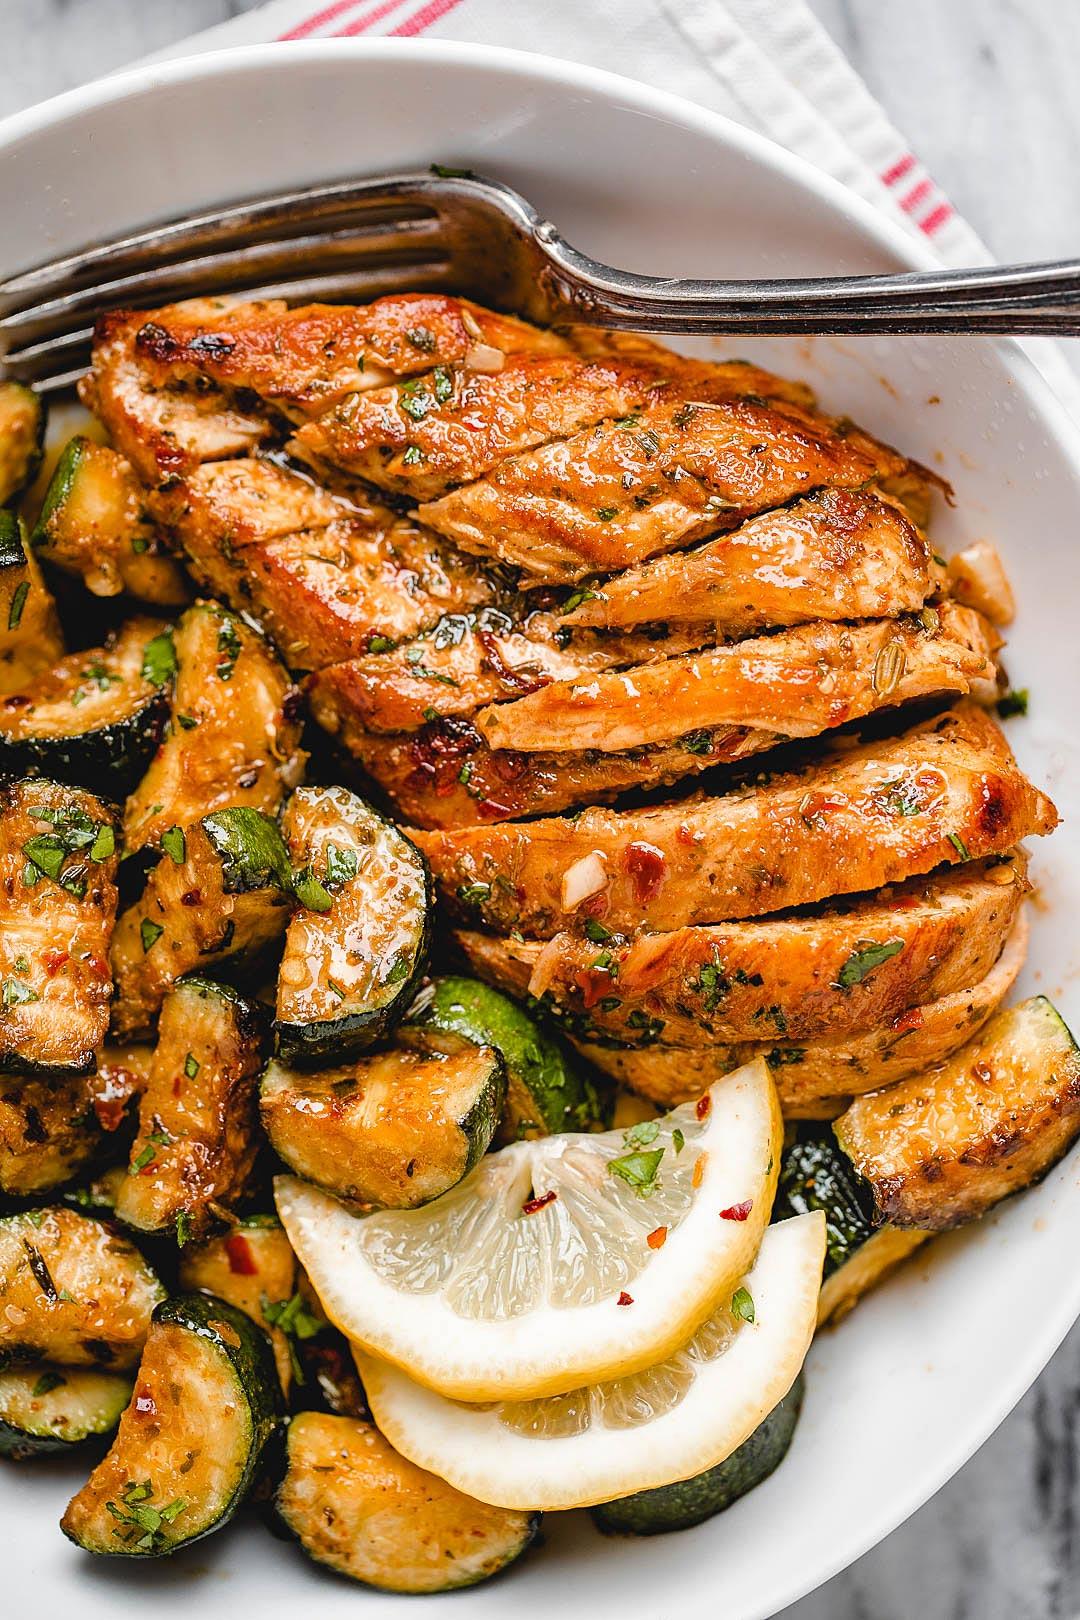 Asado Chicken And Sauteed Lemon Zucchini Recipe Chicken Asado Recipe Healthy Chicken Recipes Sauteed Zucchini Recipes